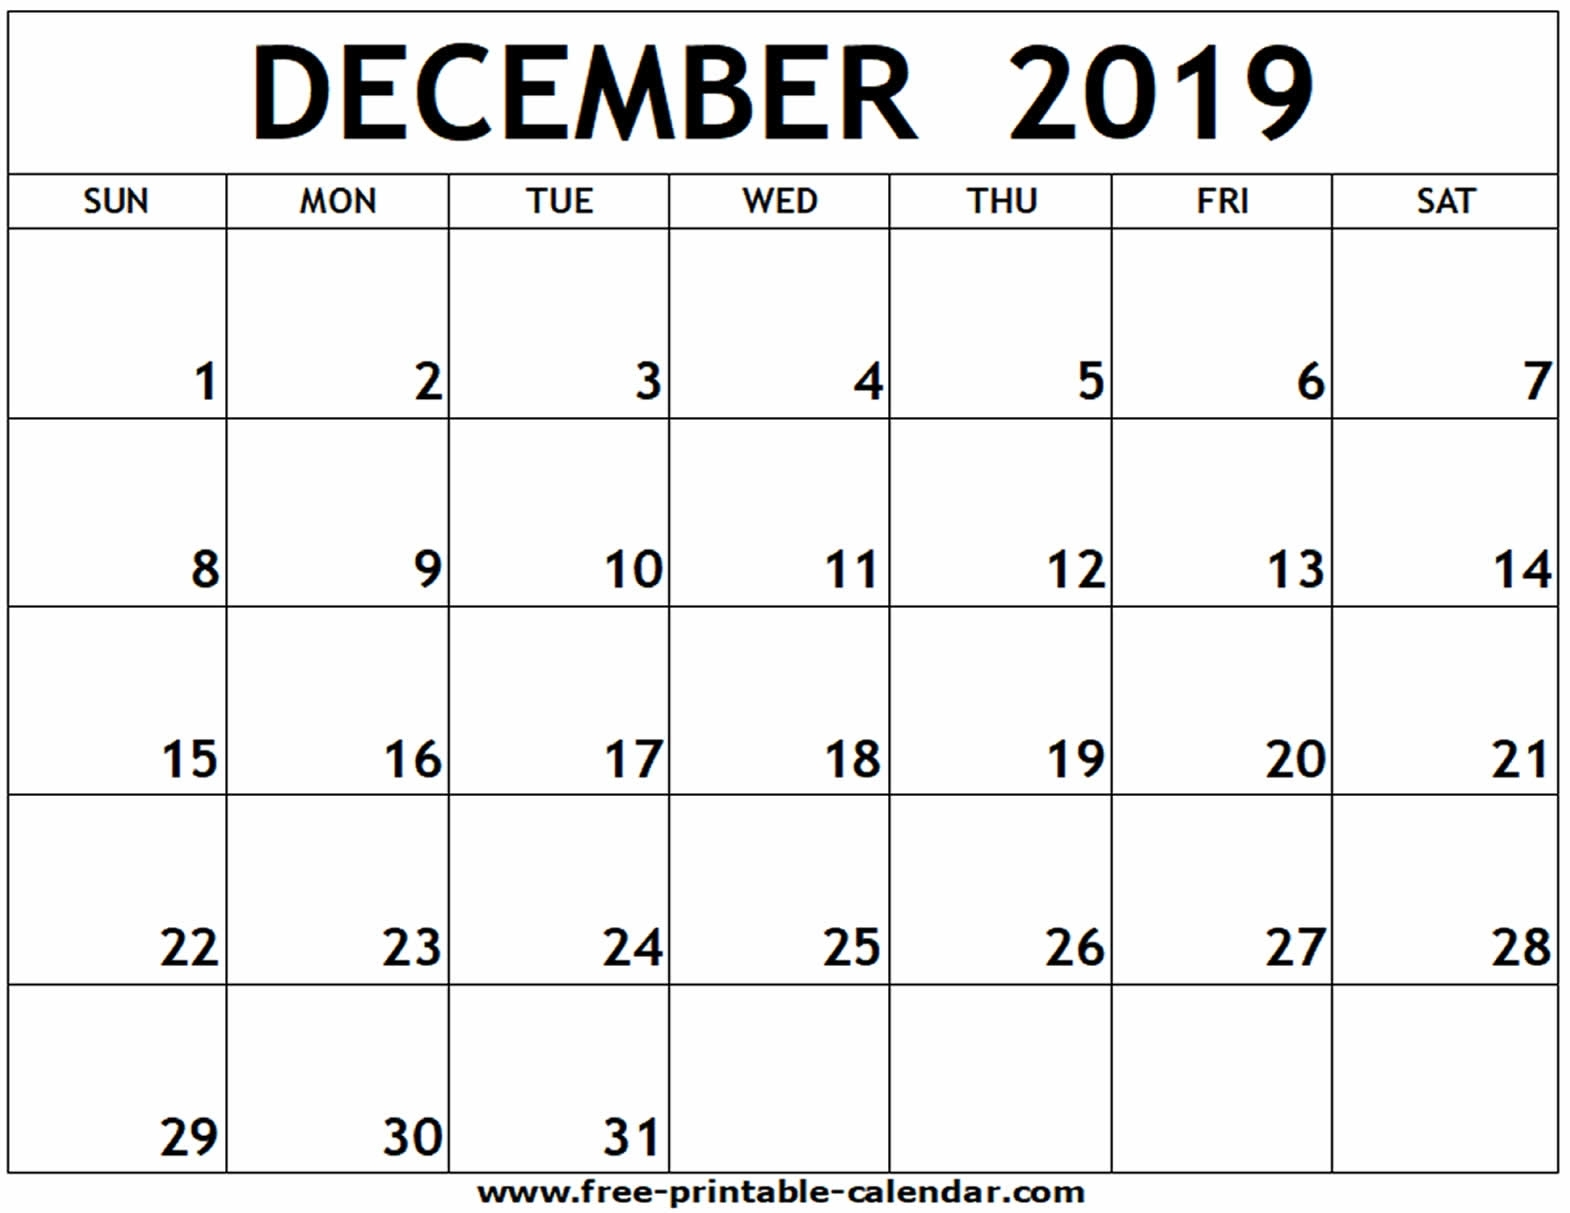 December 2019 Printable Calendar - Free-Printable-Calendar